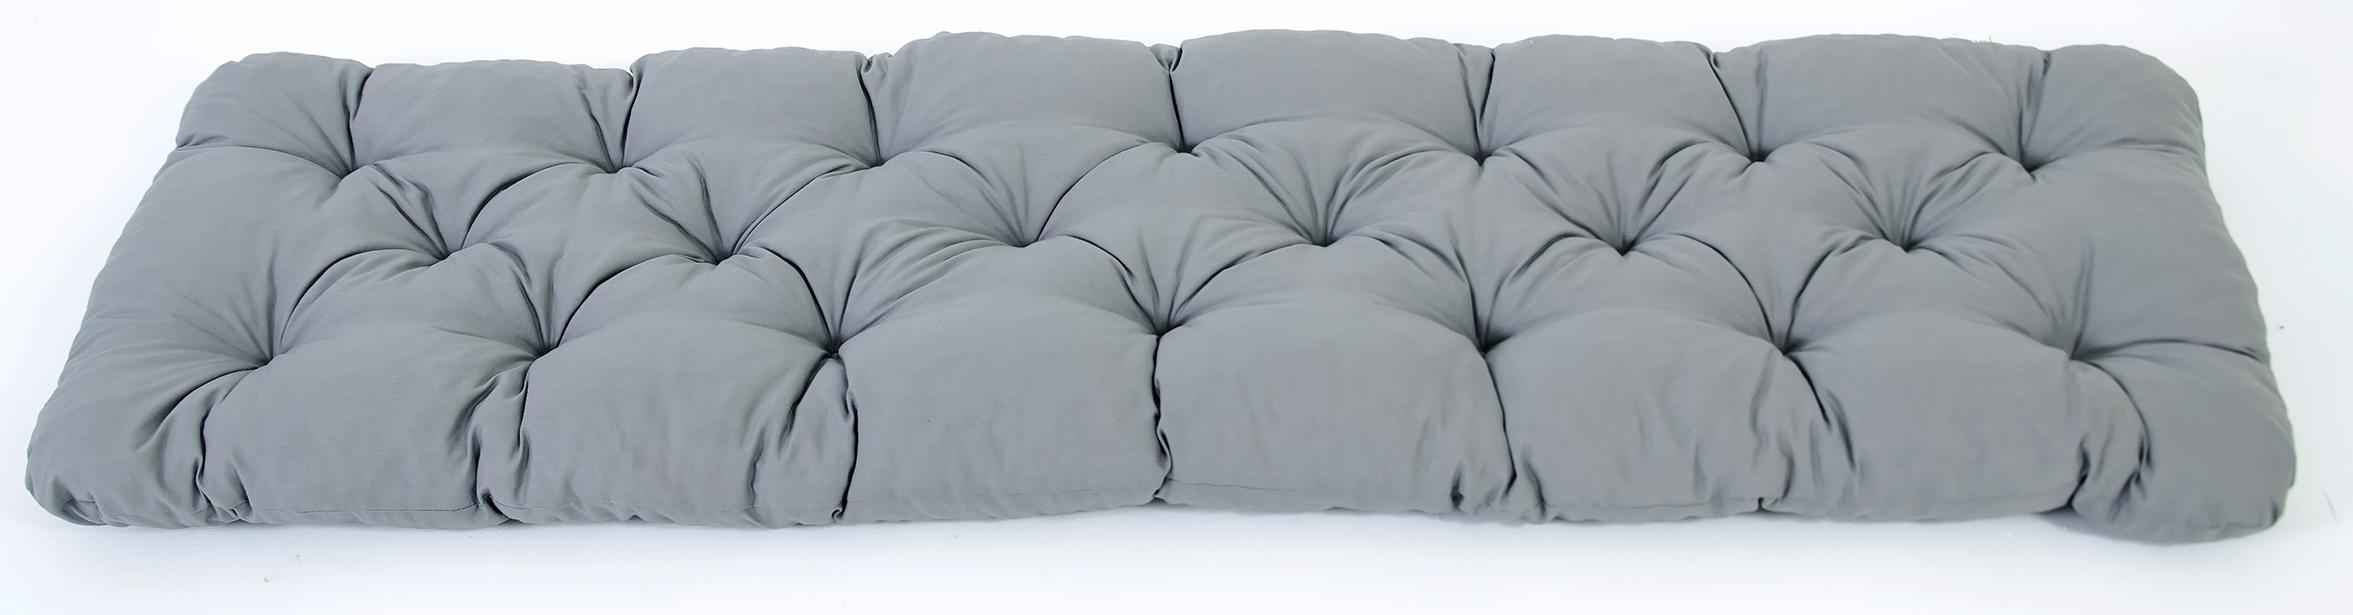 ambientehome 3er sitzkissen bank evje grau ca. Black Bedroom Furniture Sets. Home Design Ideas